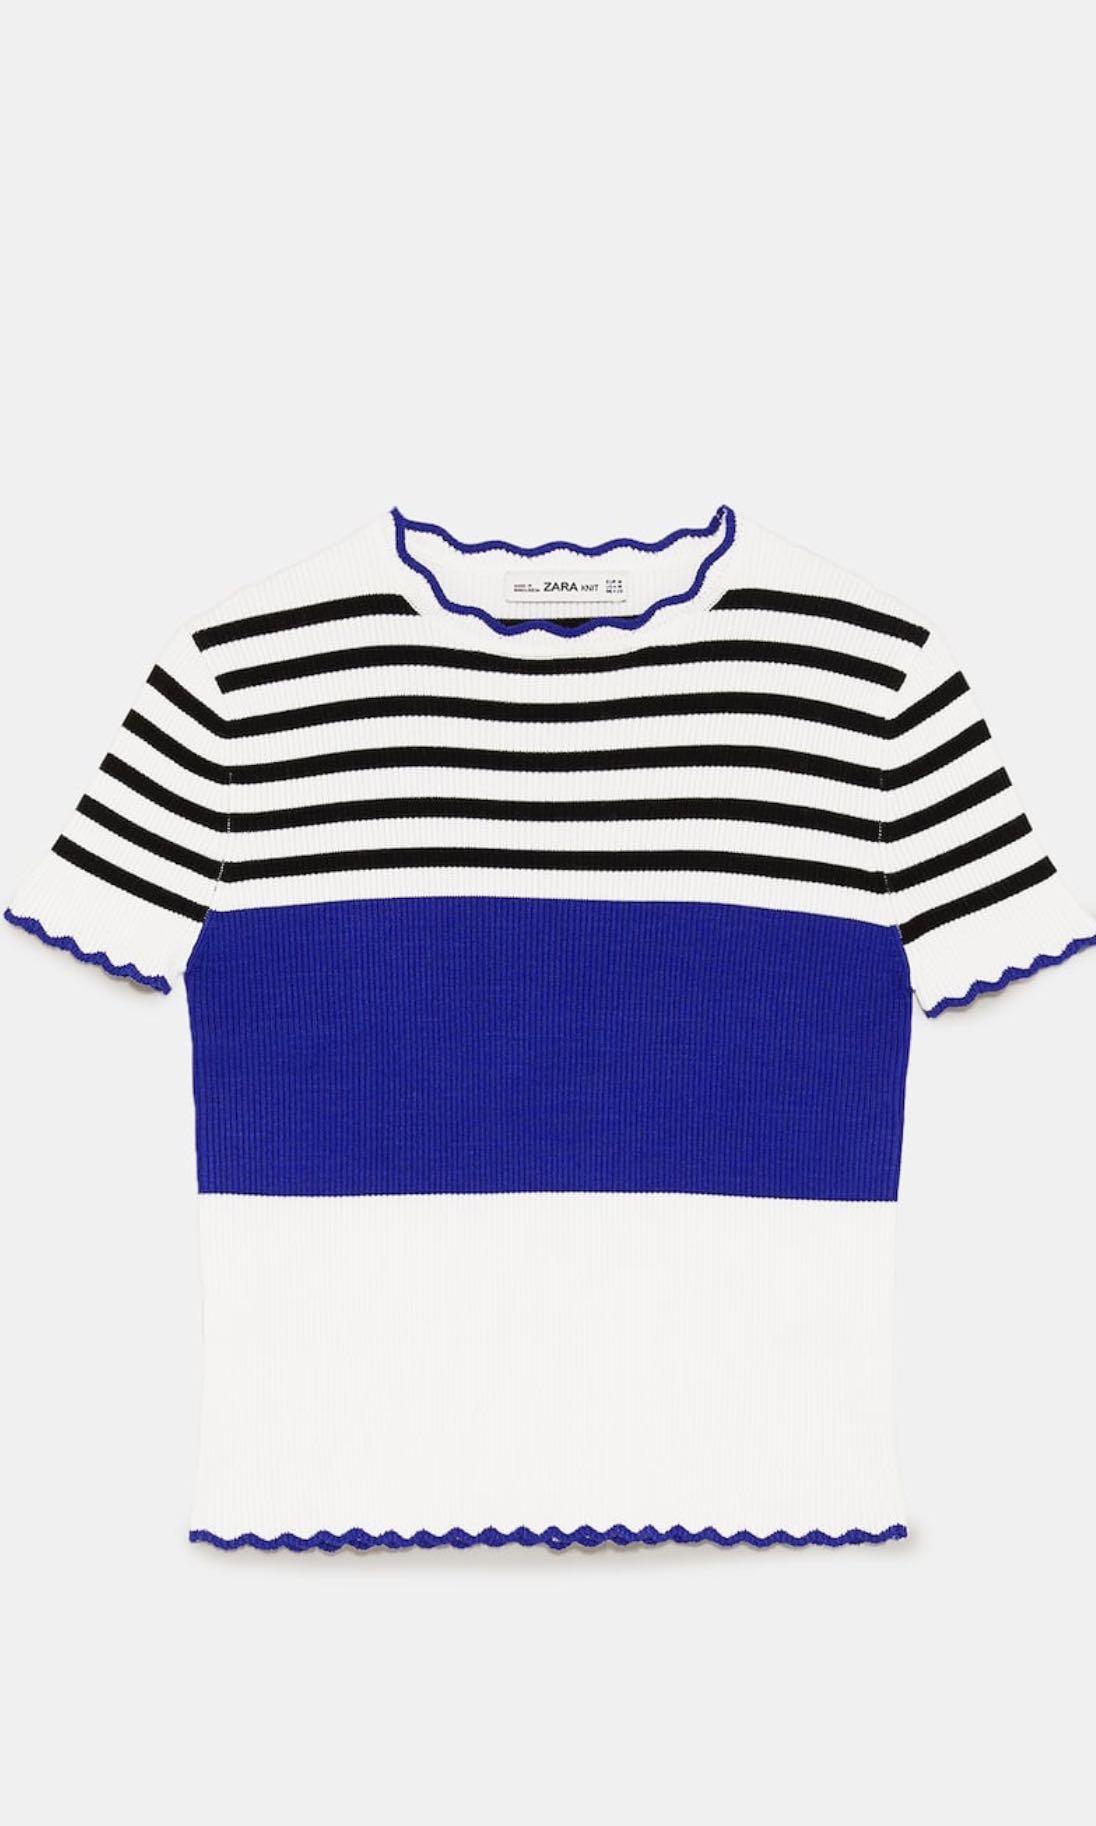 Zara striped sweater with scallop trims